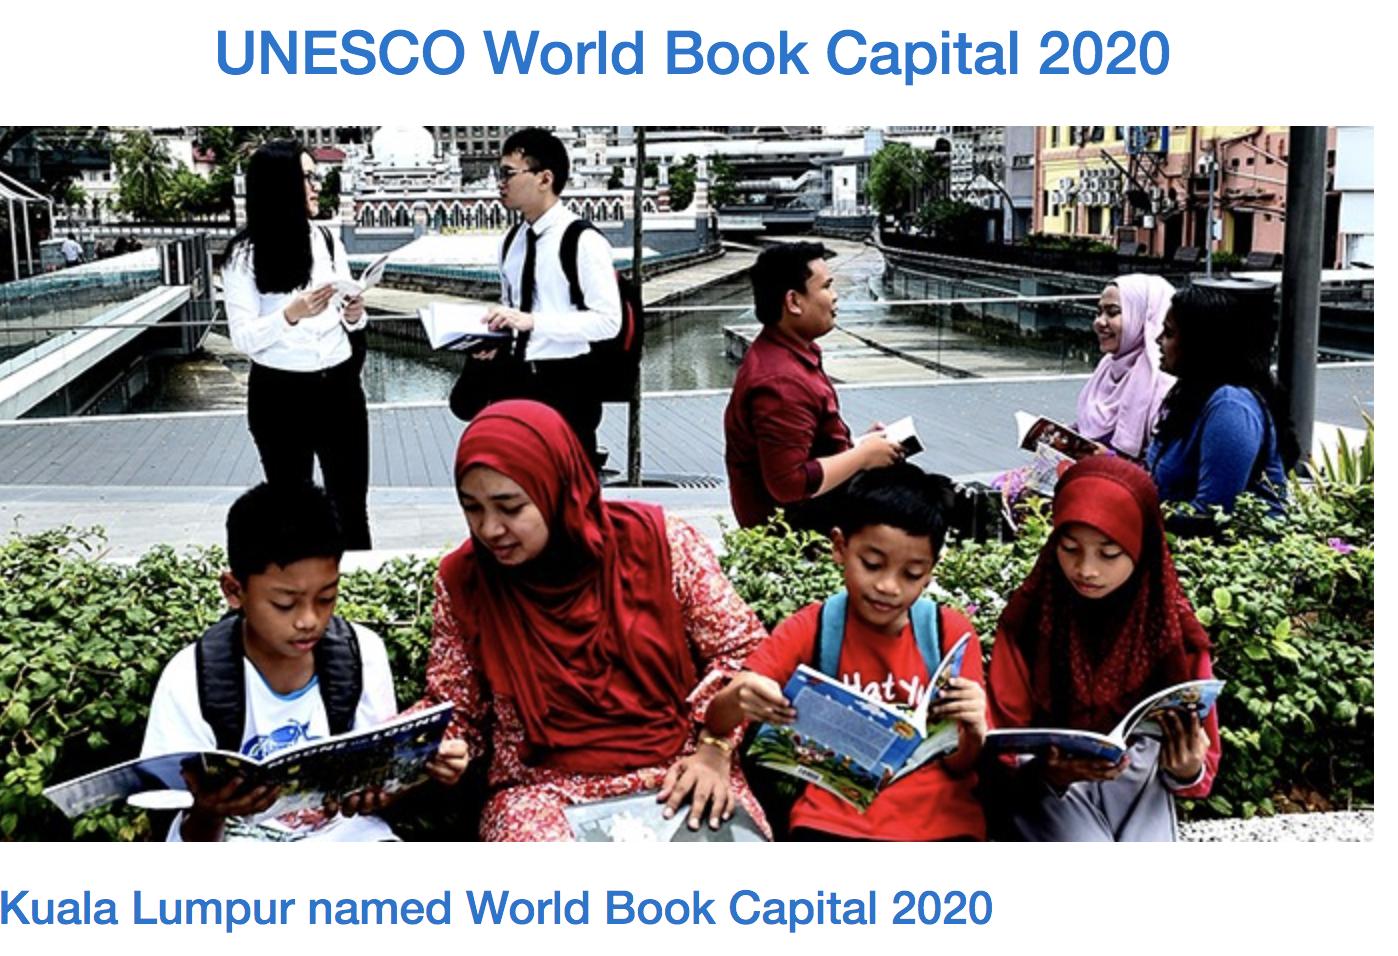 Kuala Lumpur named UNESCO World Book Capital 2020